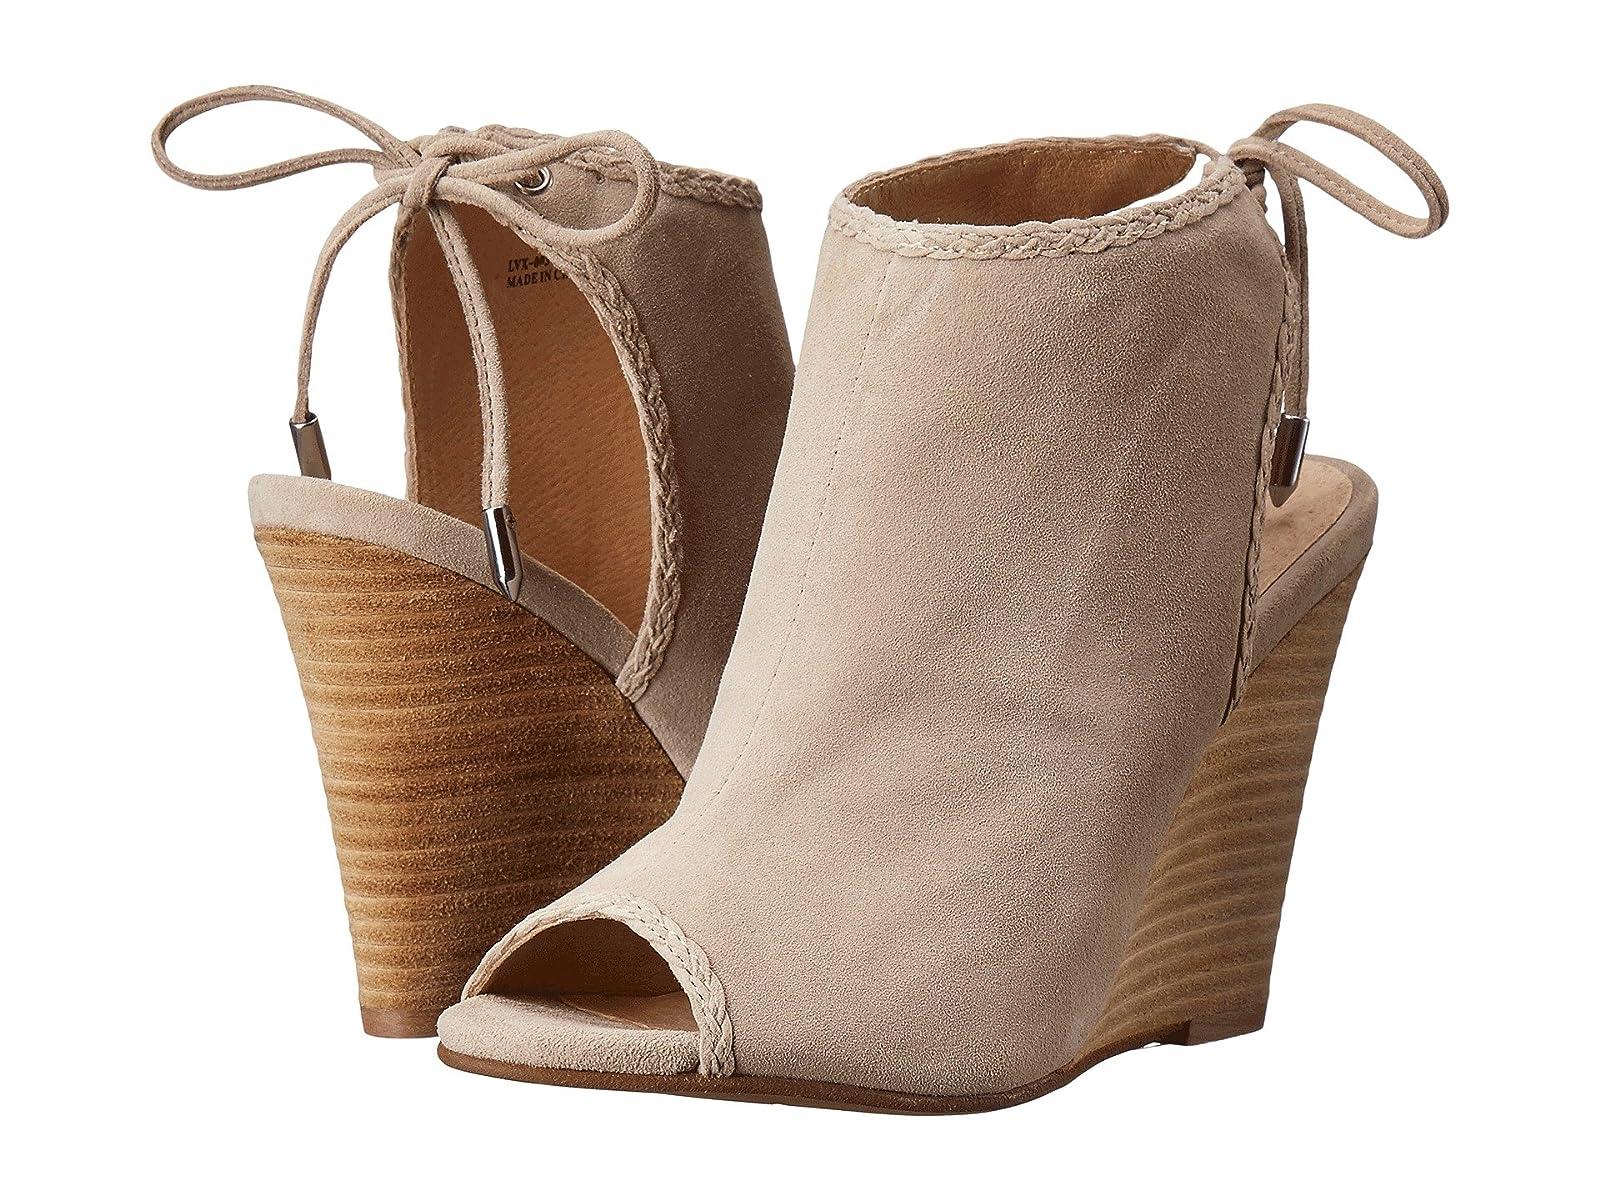 Kristin Cavallari Larox Wedge SandalCheap and distinctive eye-catching shoes